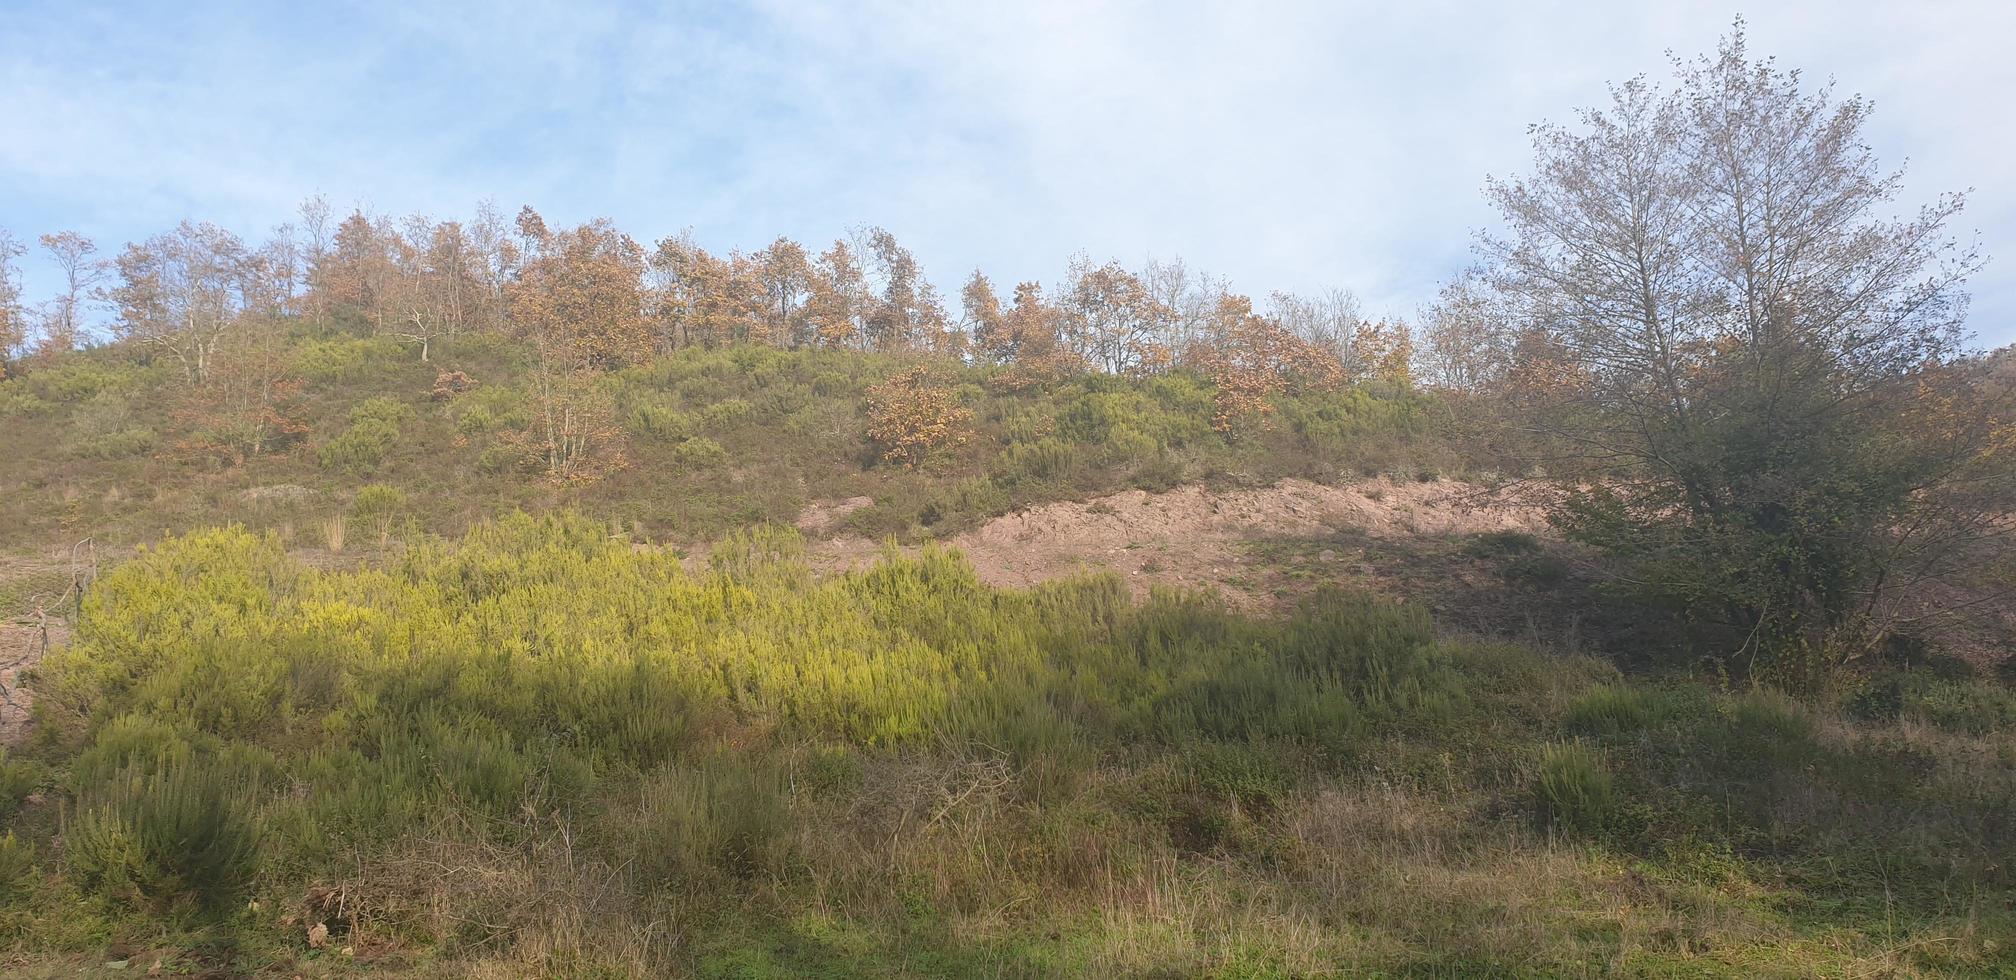 Natural landscape forest photo